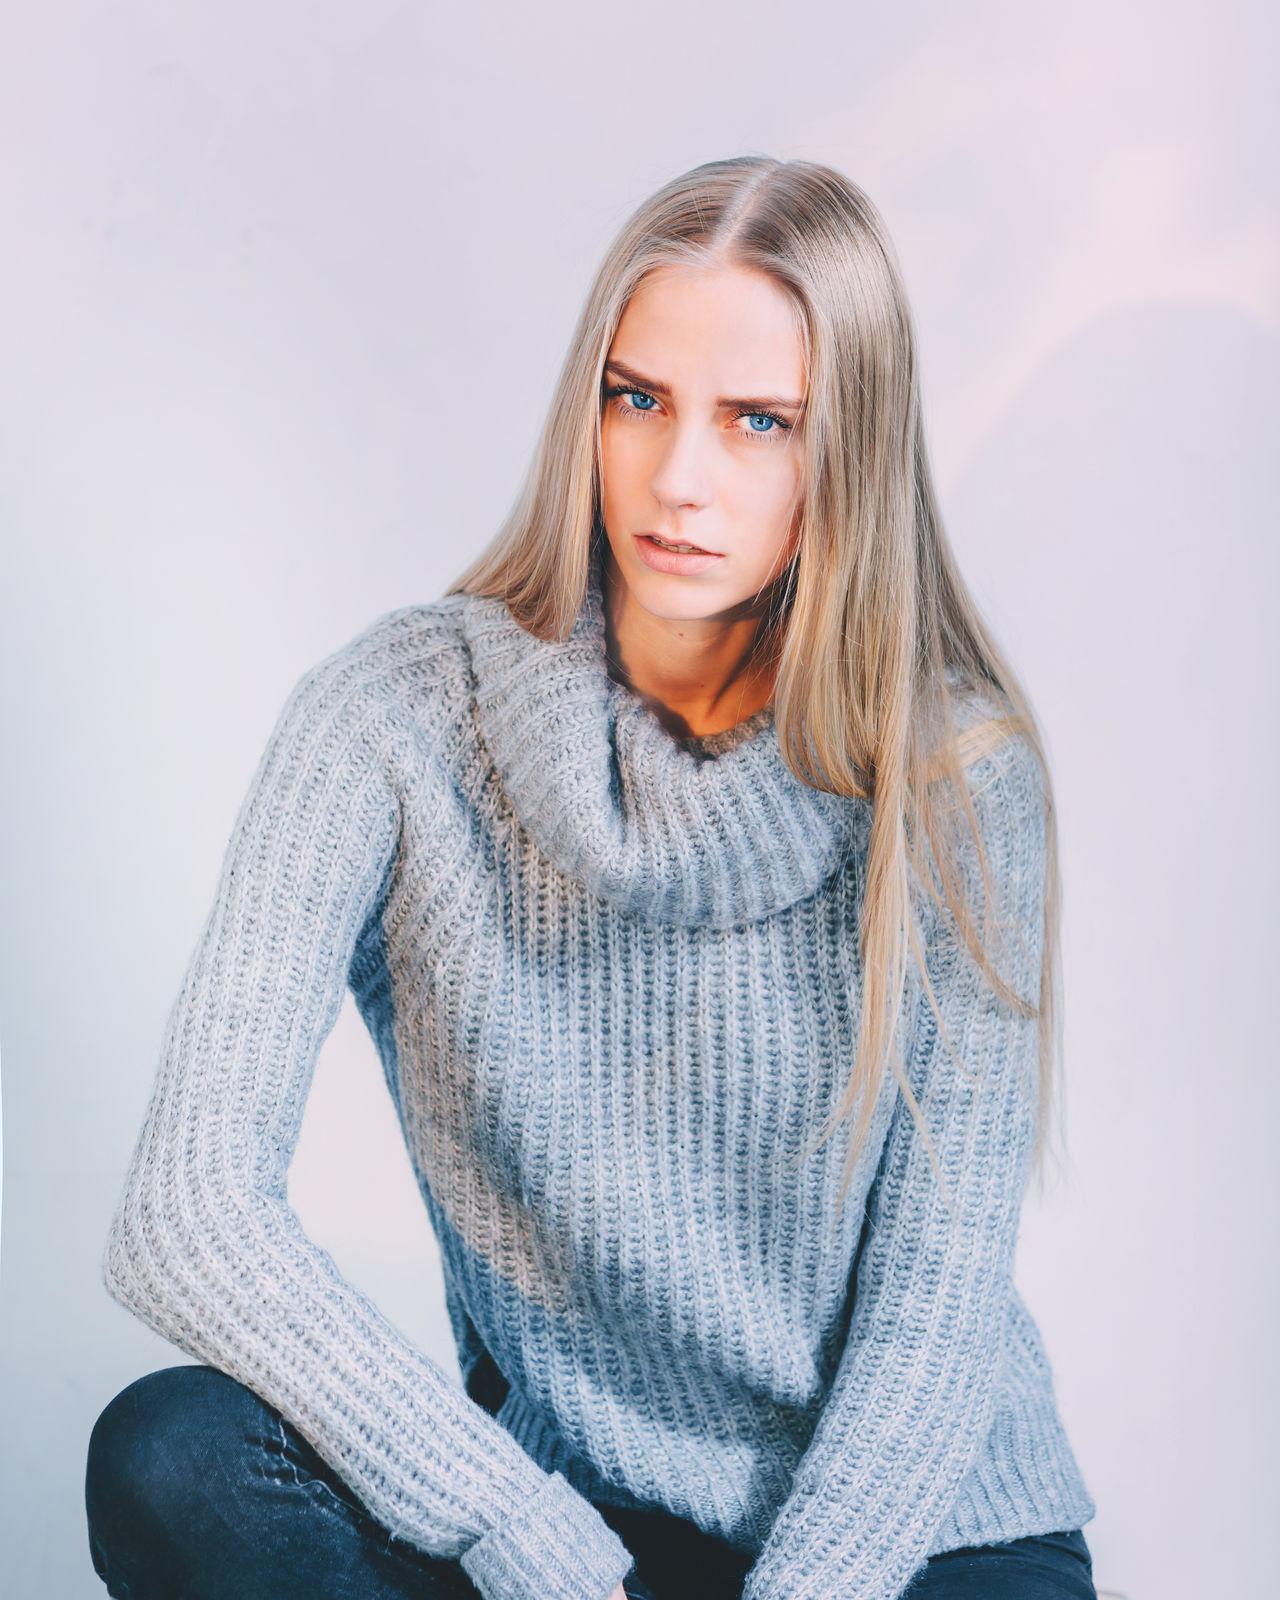 Beautiful stock photos of haare, 20-24 Years, Beautiful Woman, Caucasian Ethnicity, Confidence